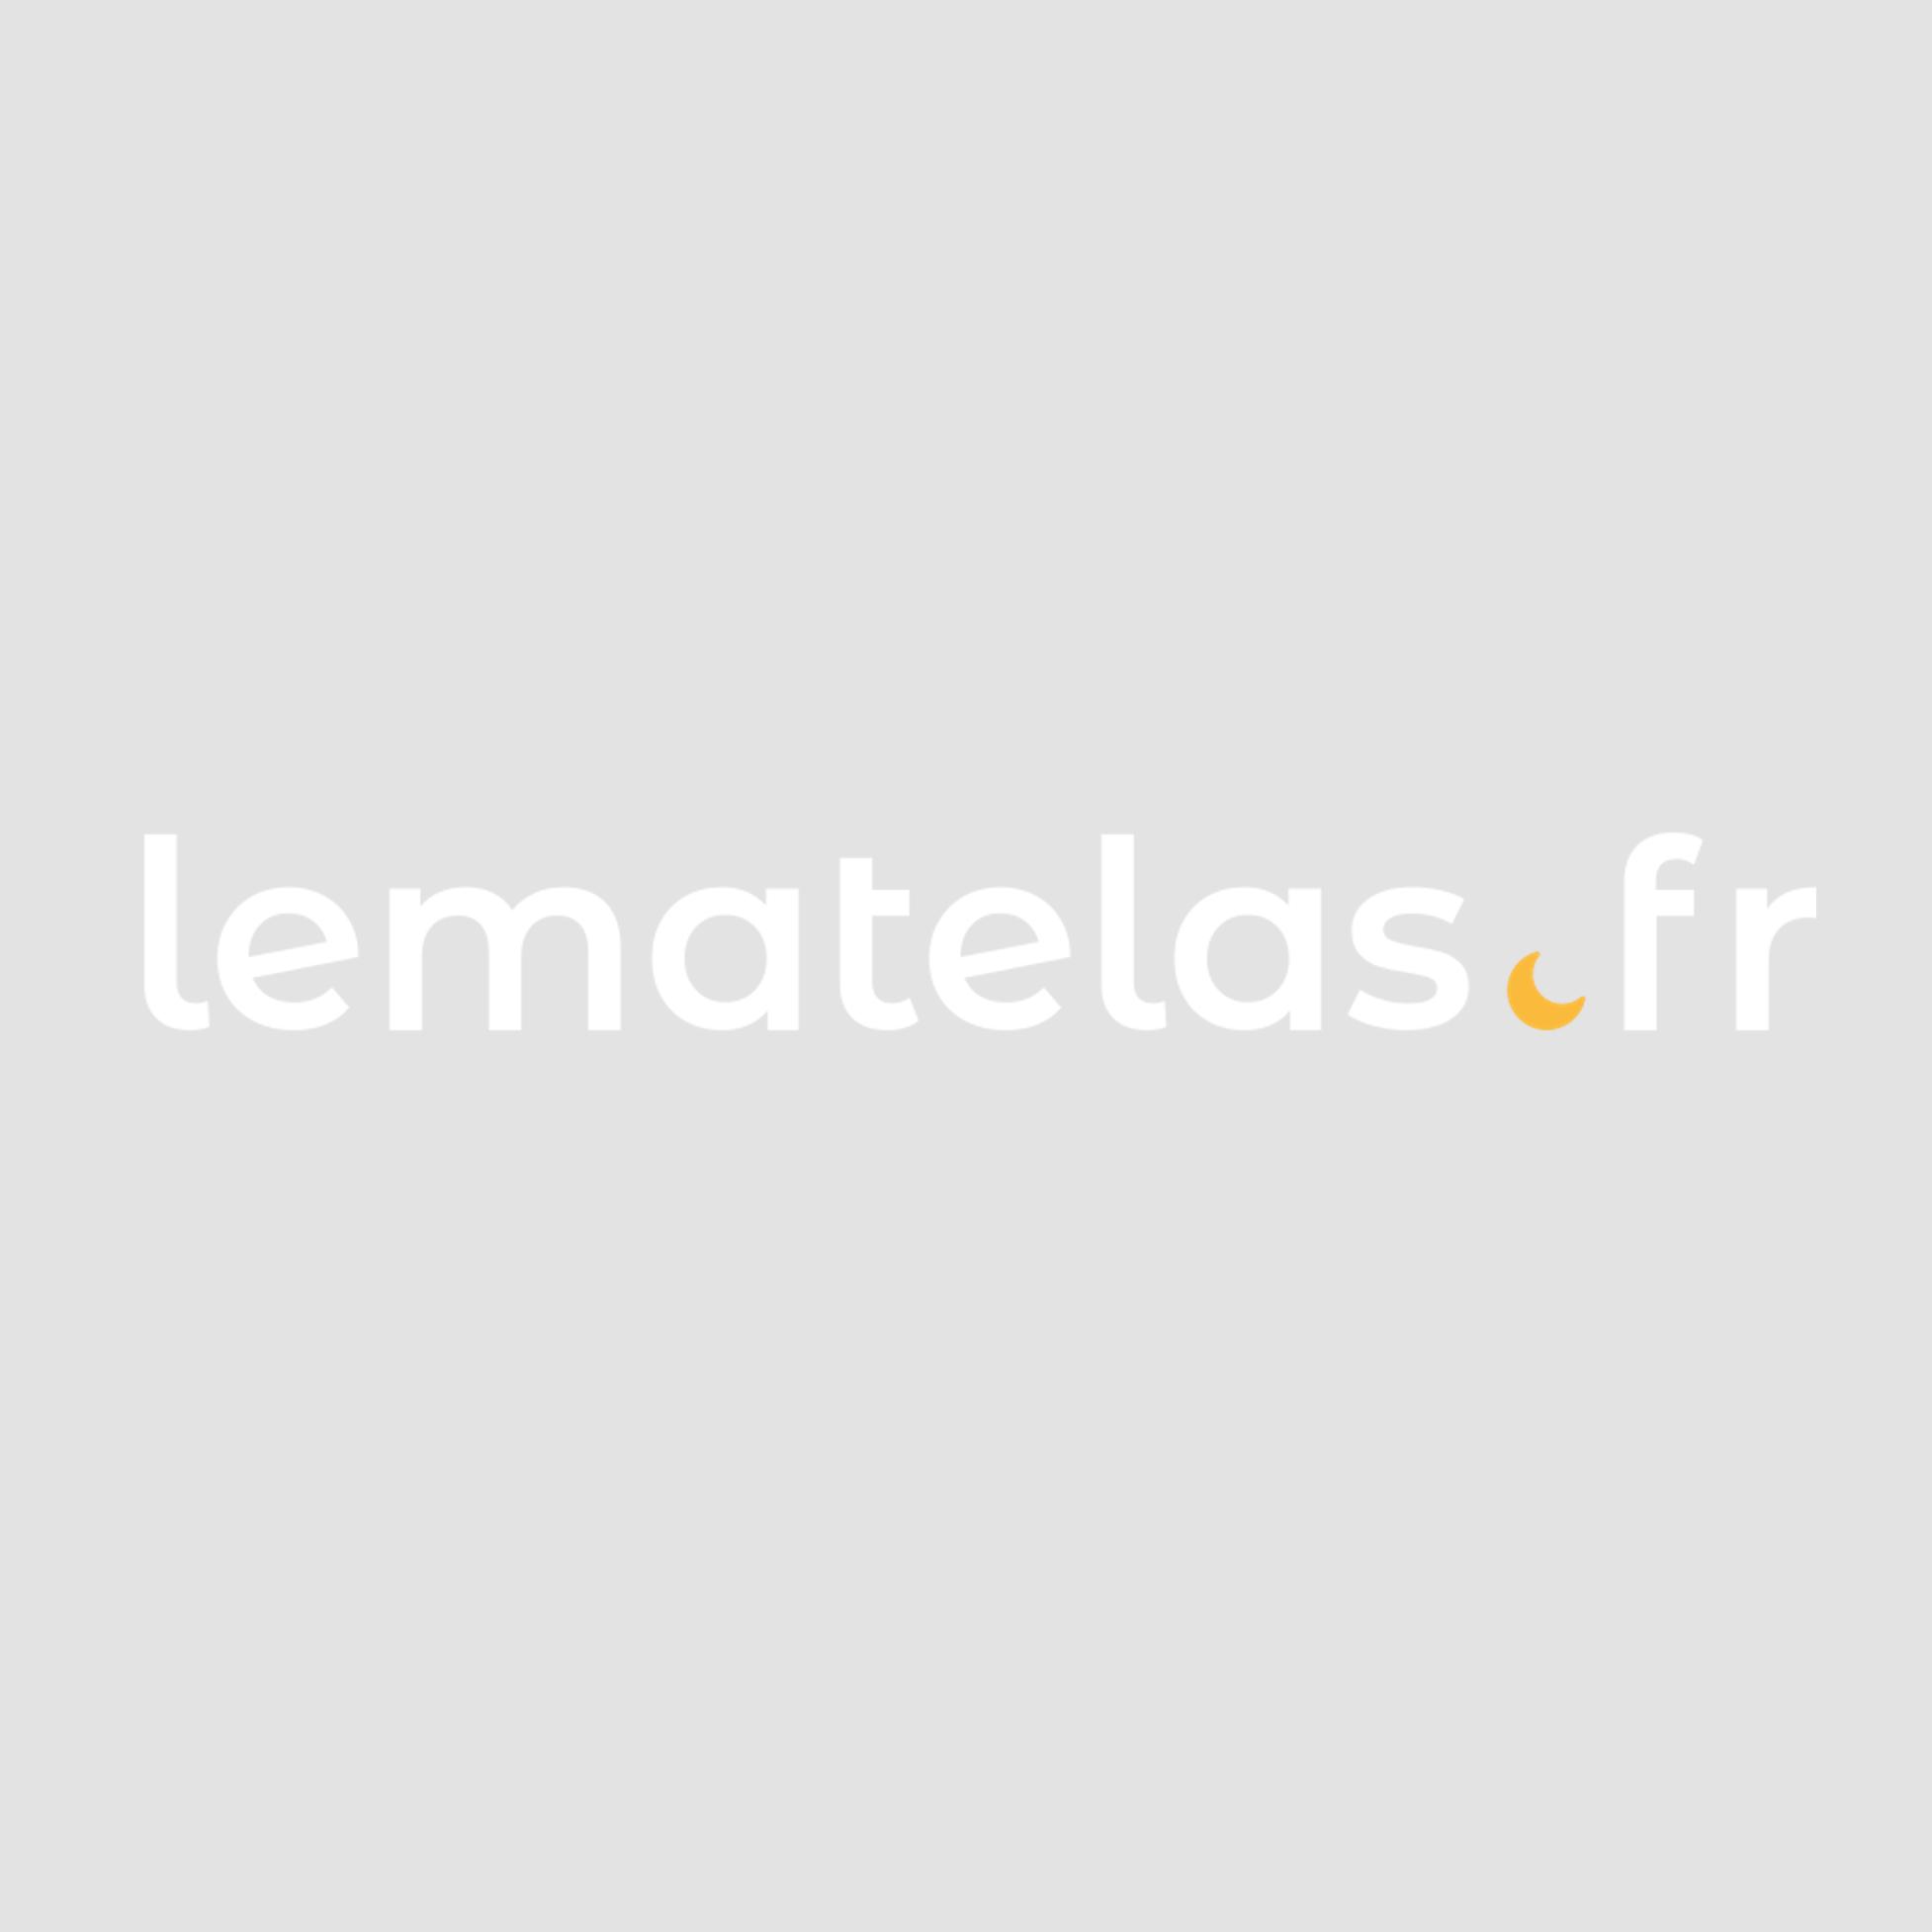 Banquette ajustable en pin massif blanc matelas écru inclus 2x70x100